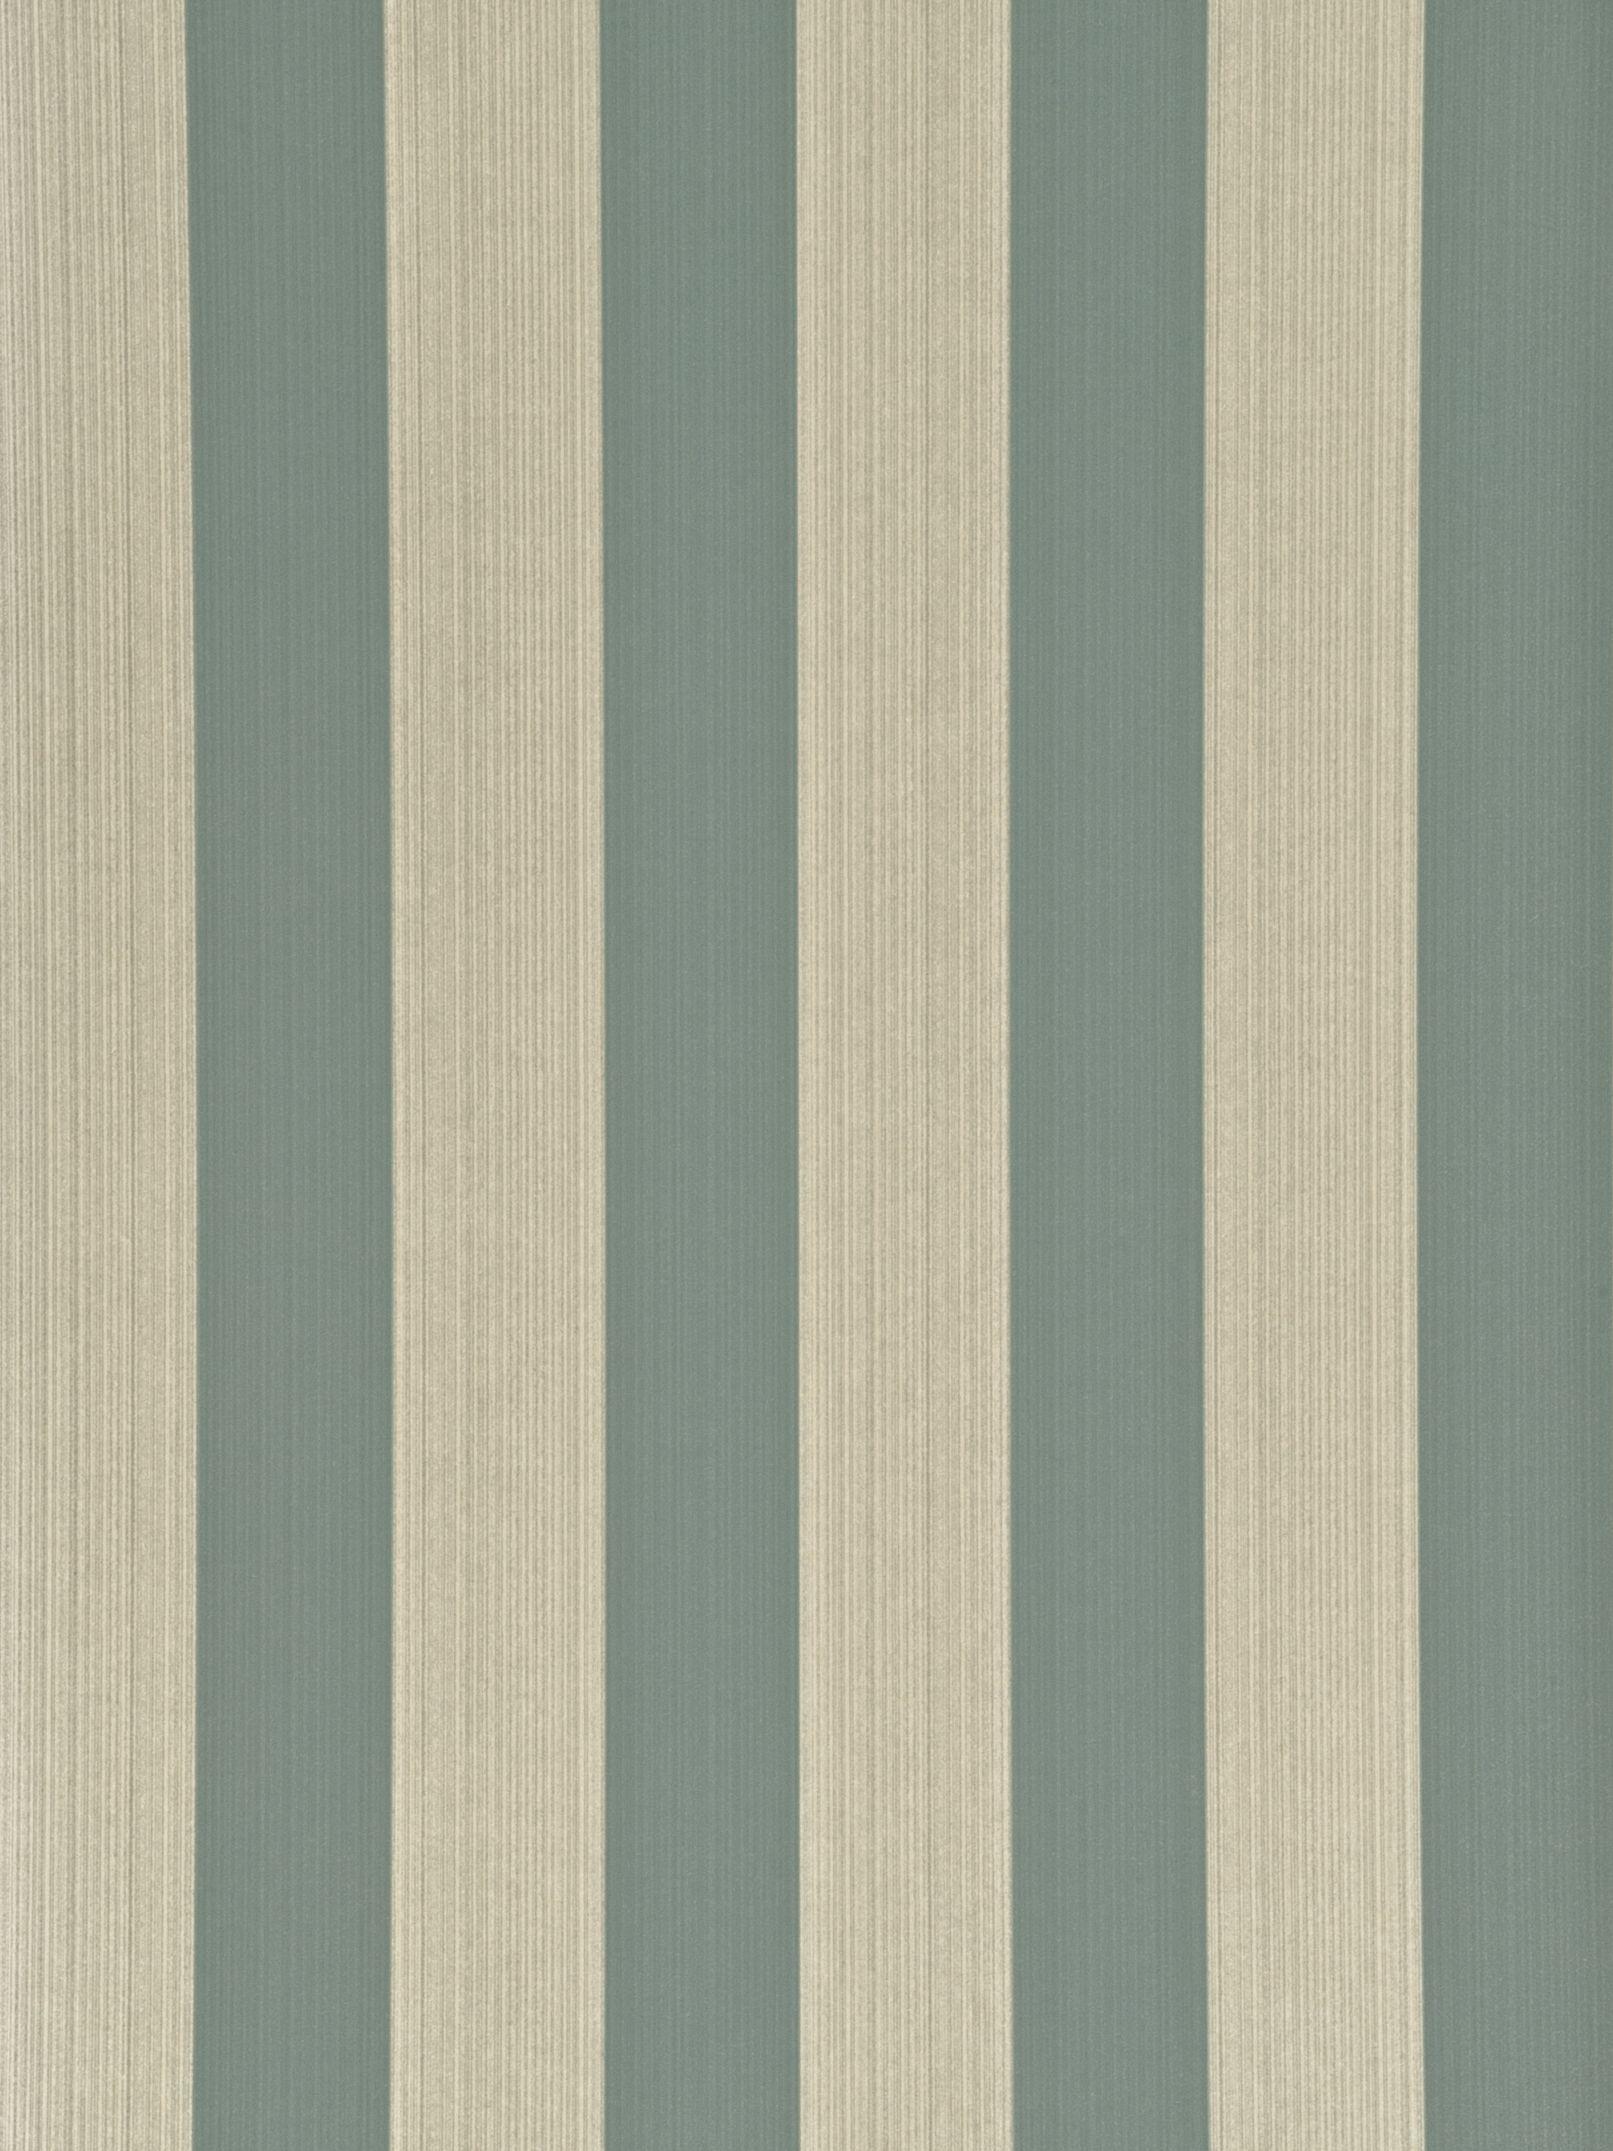 GP & J Baker GP & J Baker Lydford Stripe Paste the Wall Wallpaper